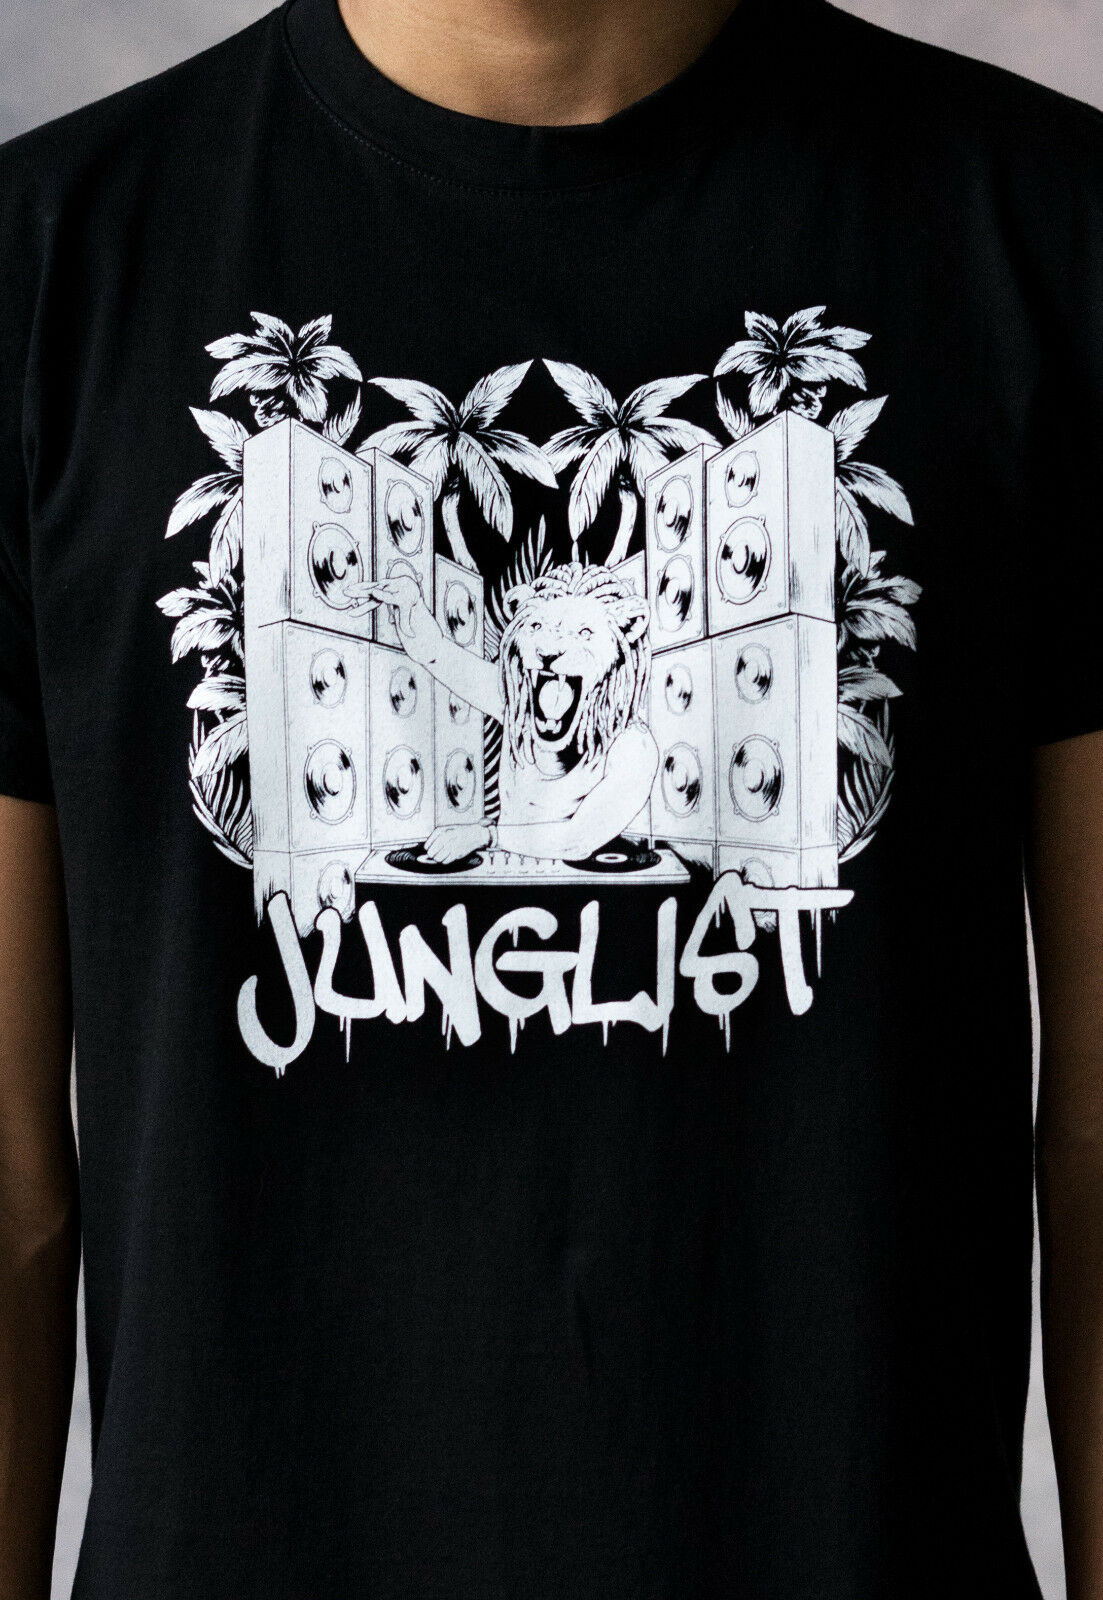 Tambor e baixo leão dj t camisa n & música selva neuropfunk junglist amen masculino t